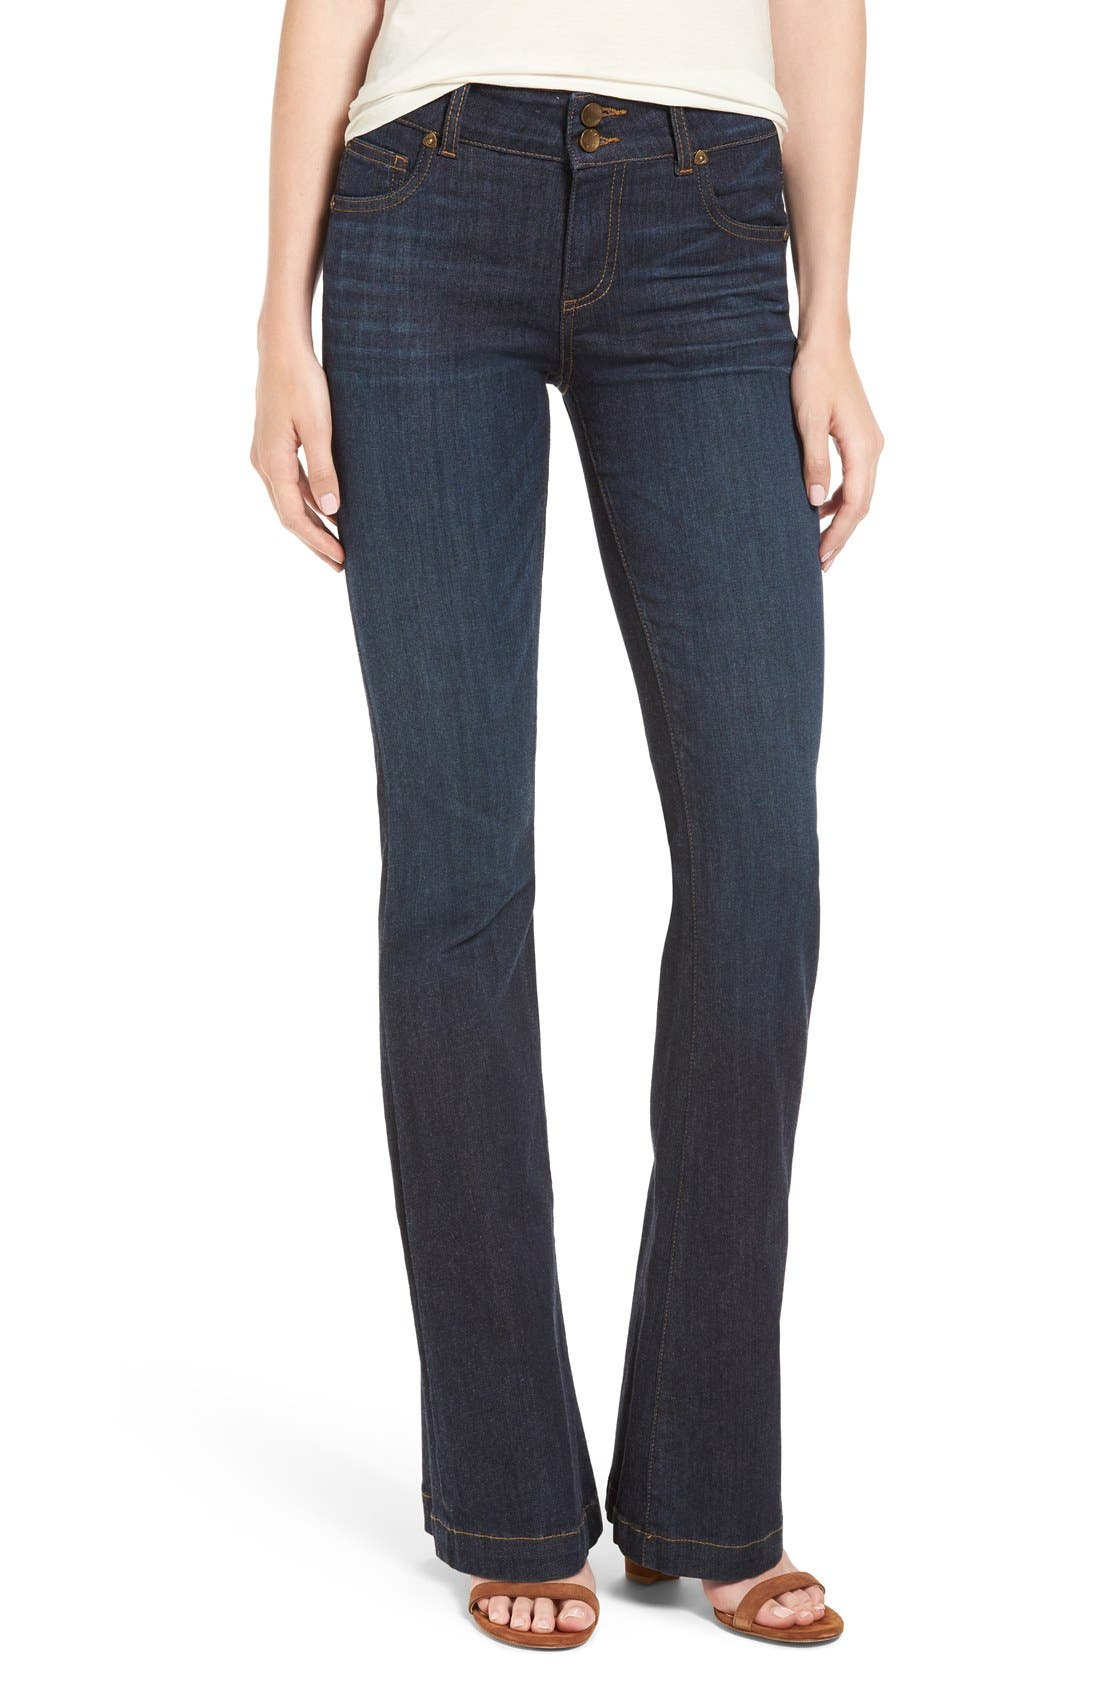 Alternate Image 1 Selected - KUT from the Kloth 'Chrissy' Flare Leg Jeans (Brightness)